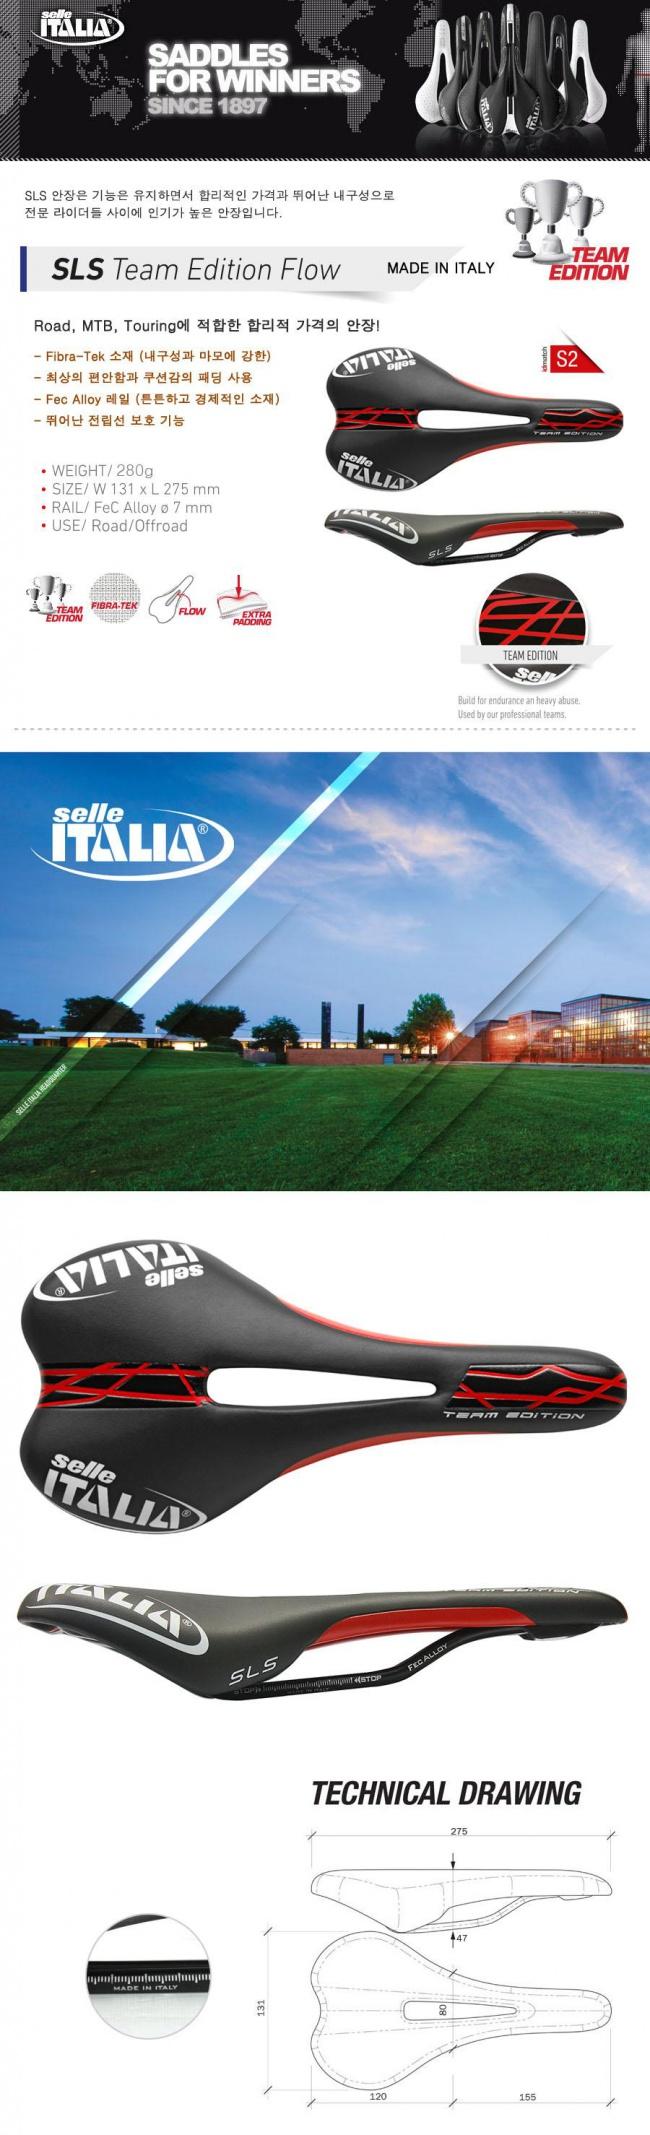 selle italia c2 gel flow black saddle review